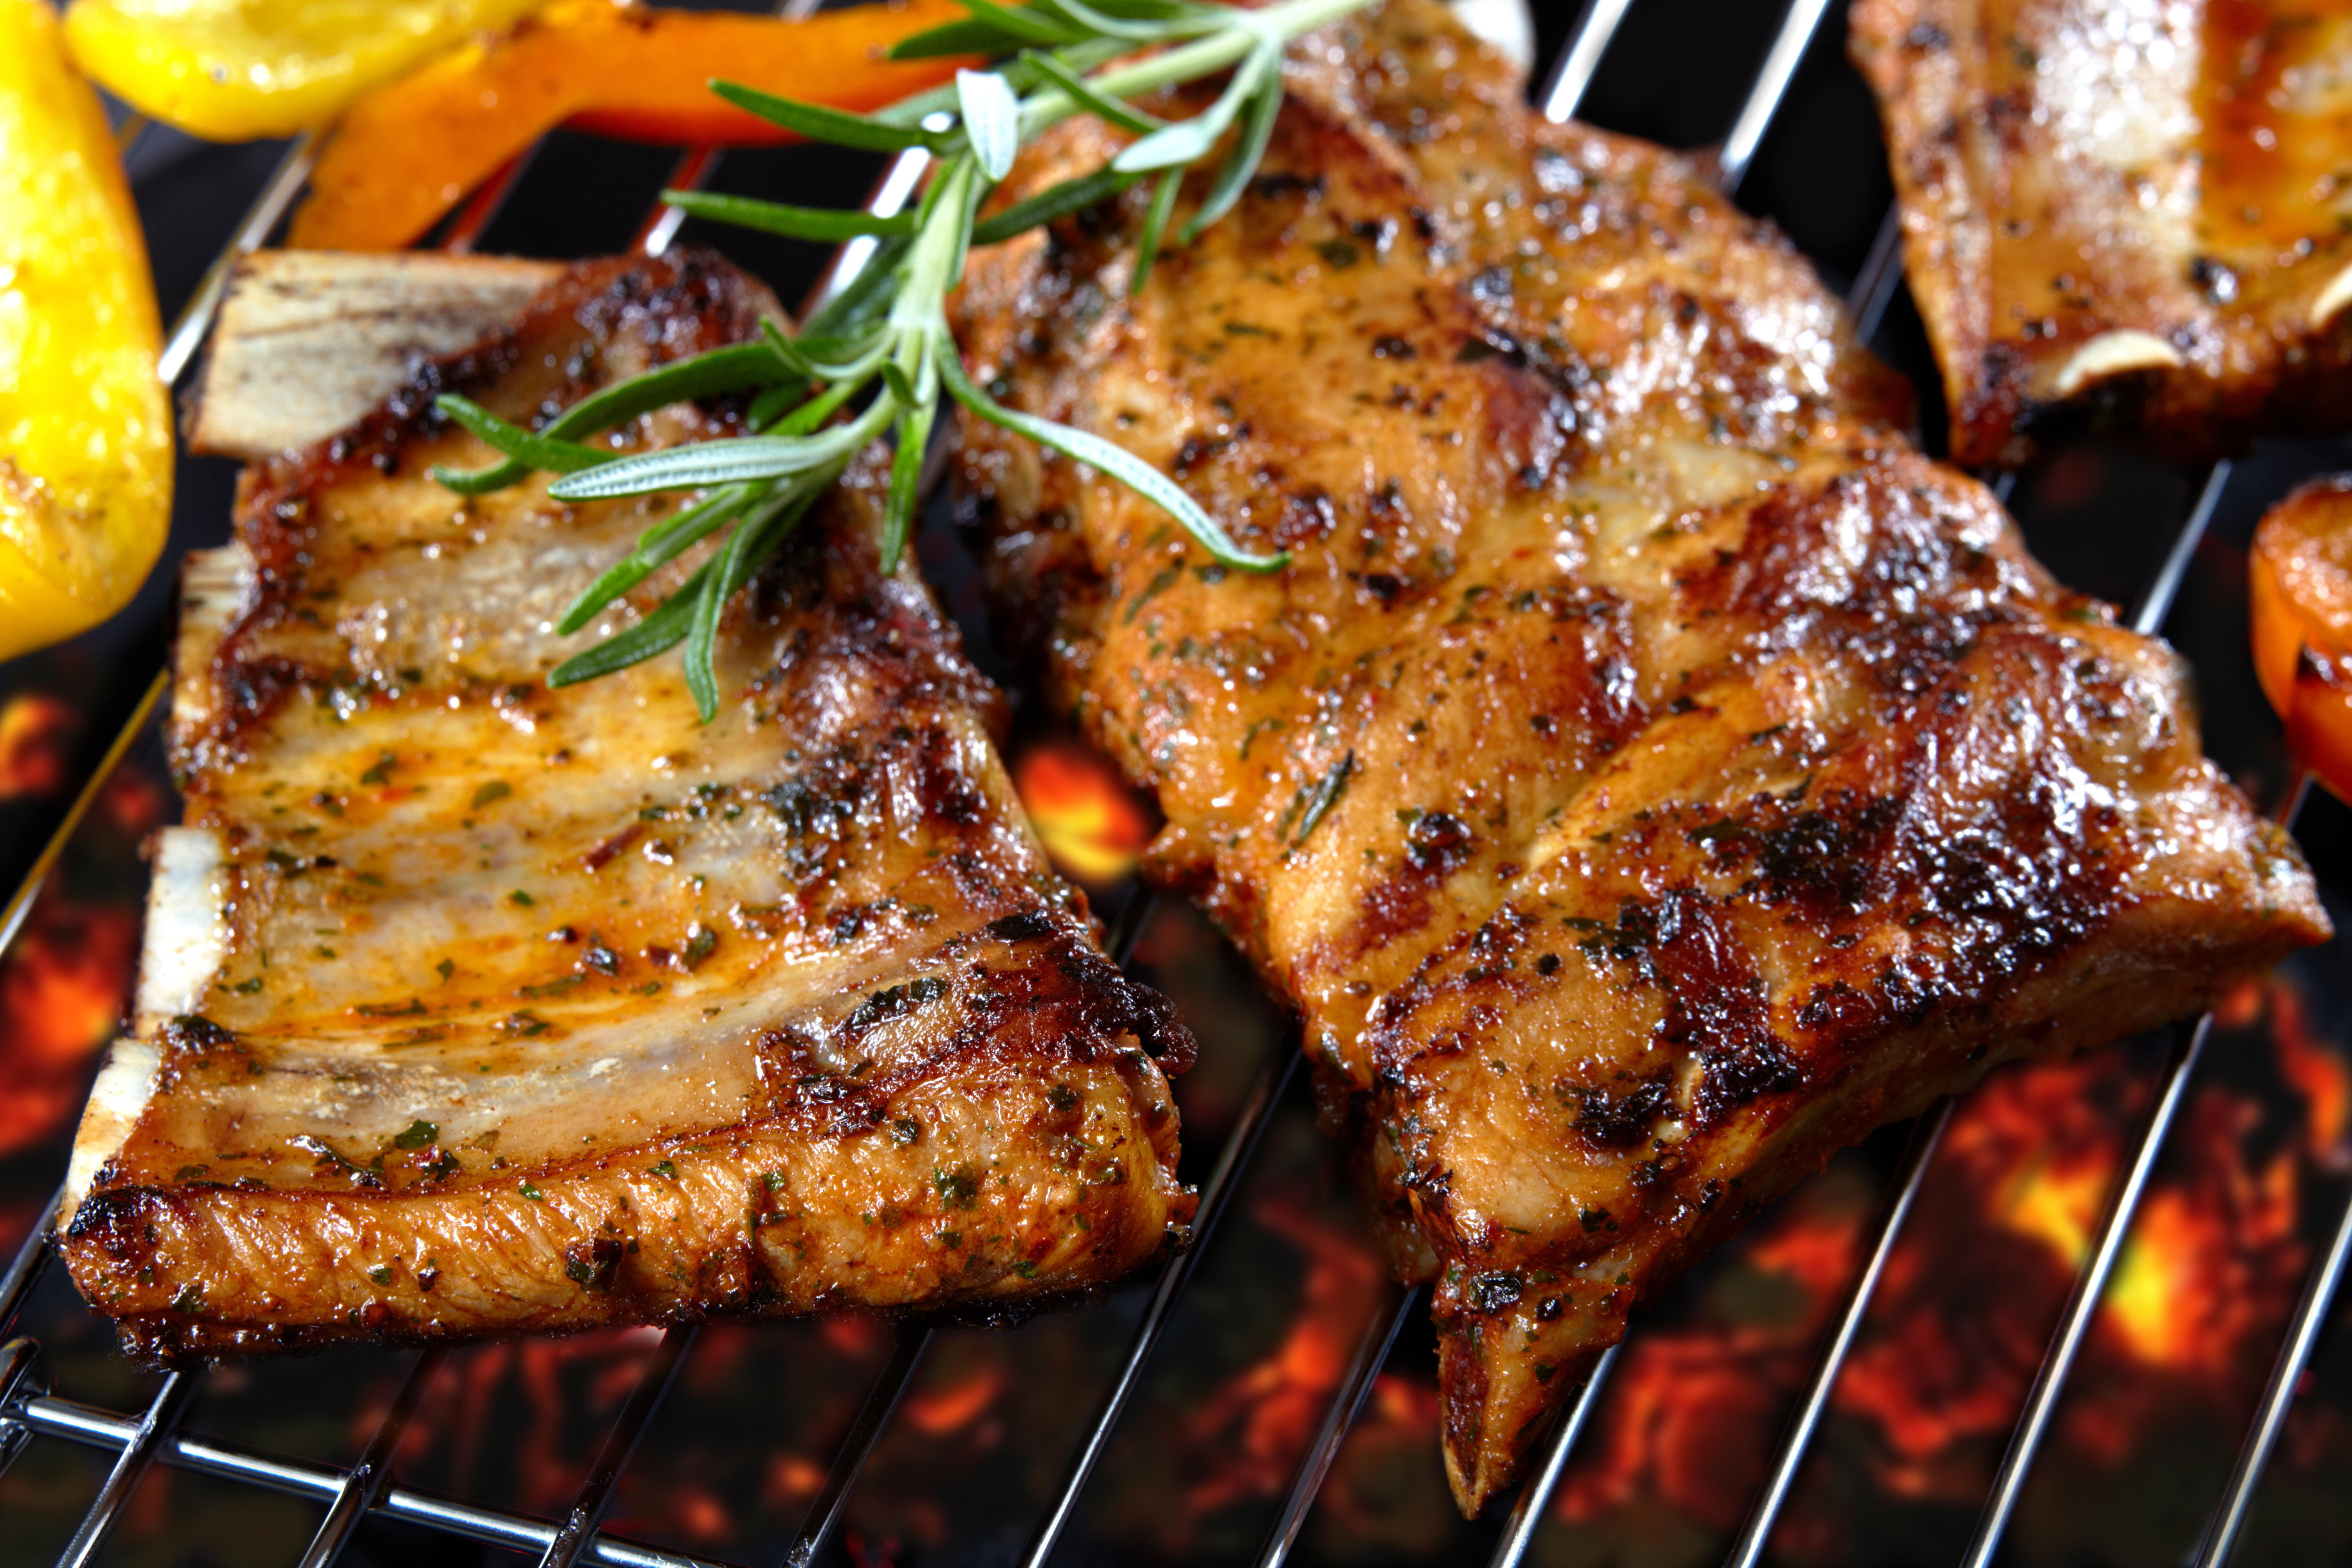 Pork grilling photo